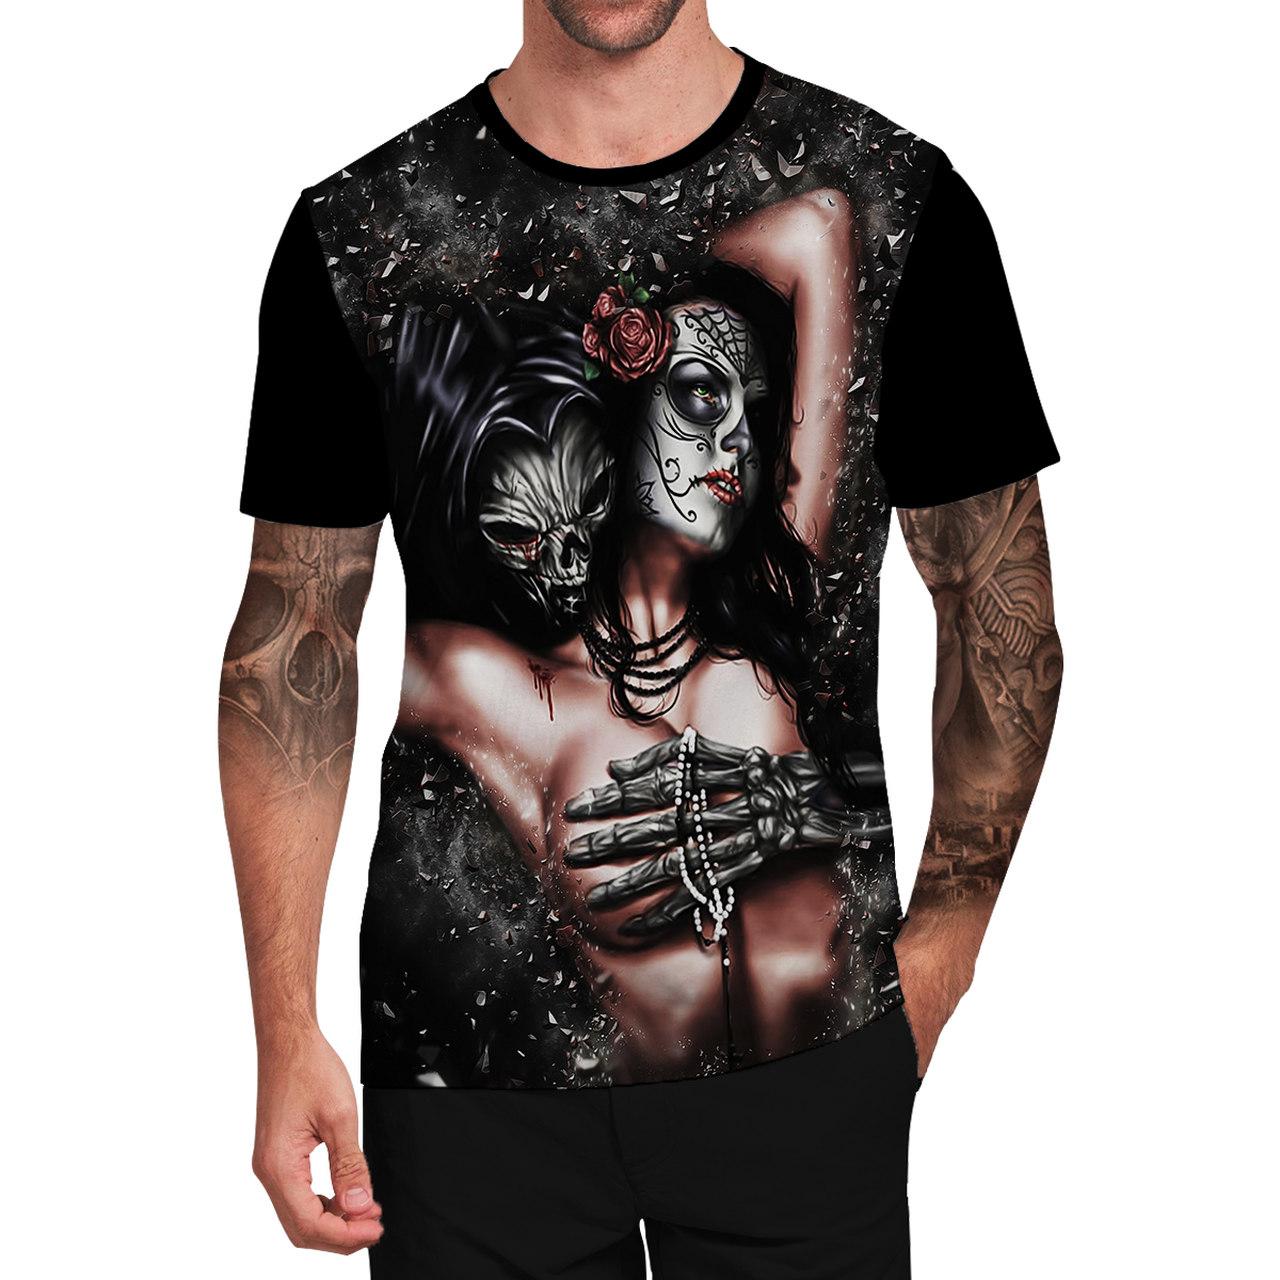 Stompy Camiseta Tattoo Tatuagem Caveira Skull 35